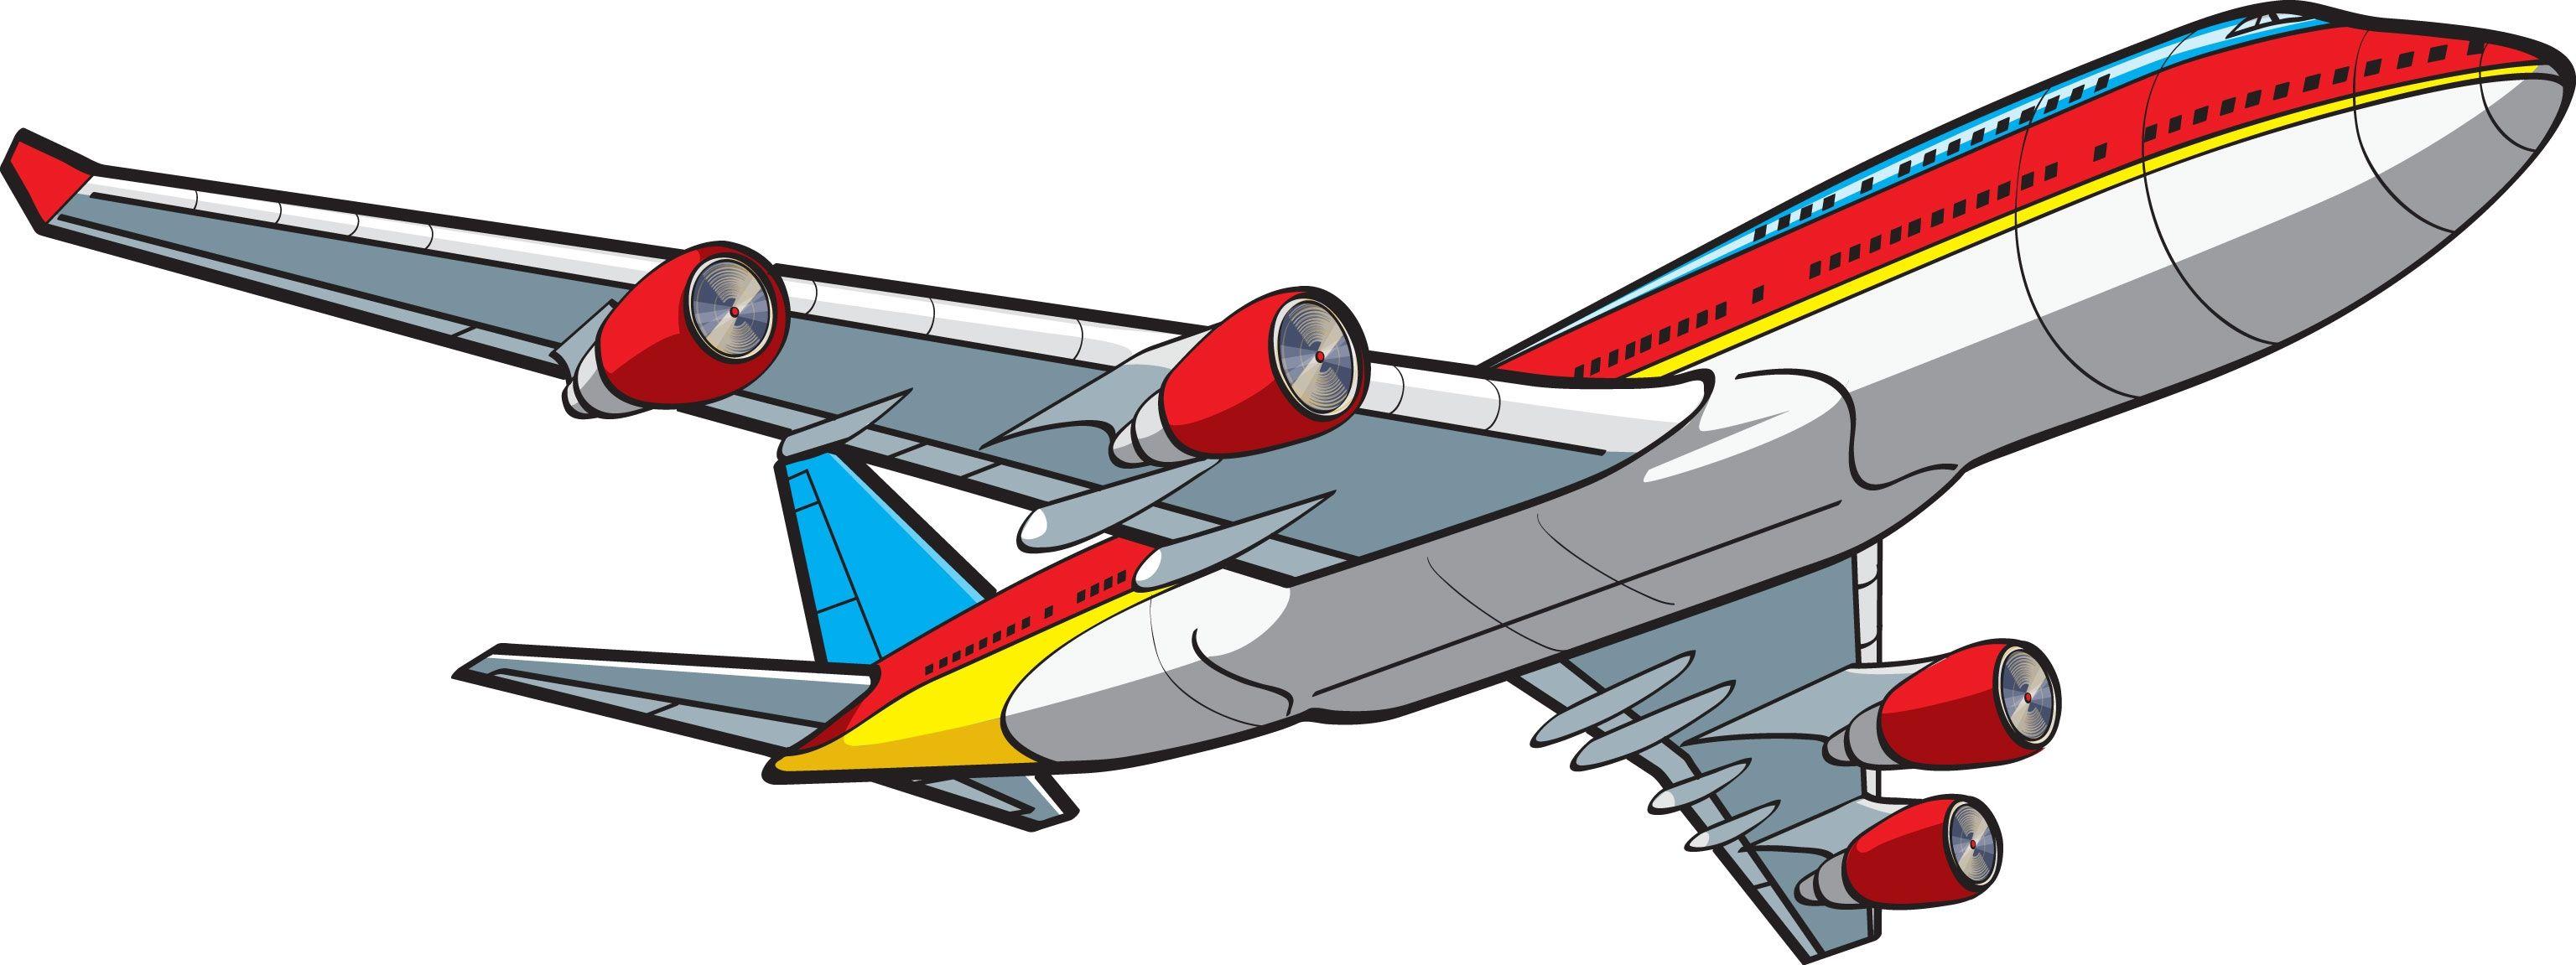 airplane clipart designs pinterest aeroplanes rh pinterest co uk airplane clipart free